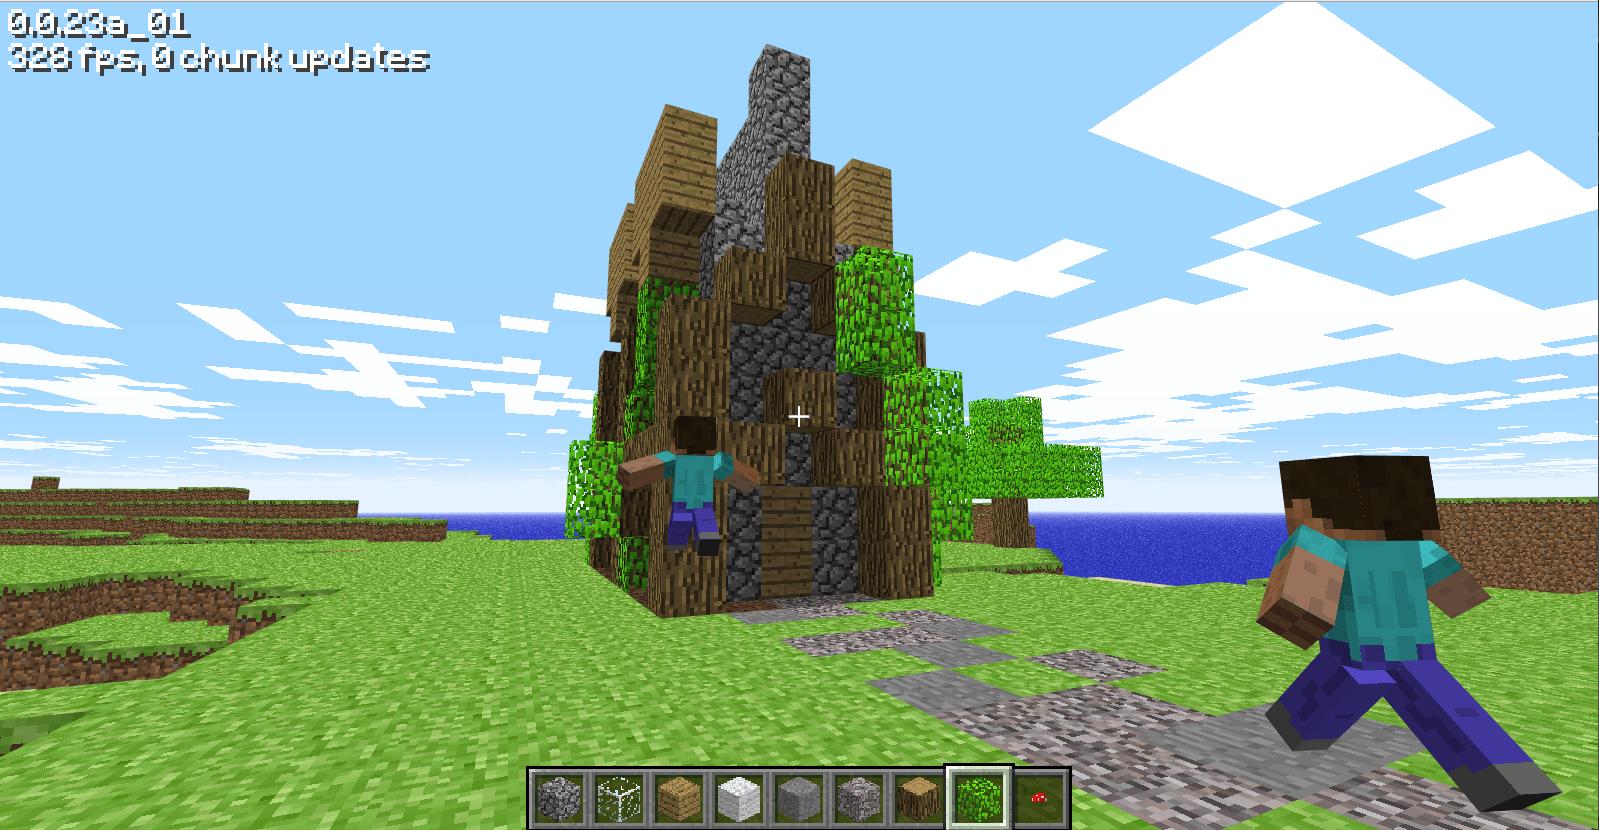 starting minecraft at 2010